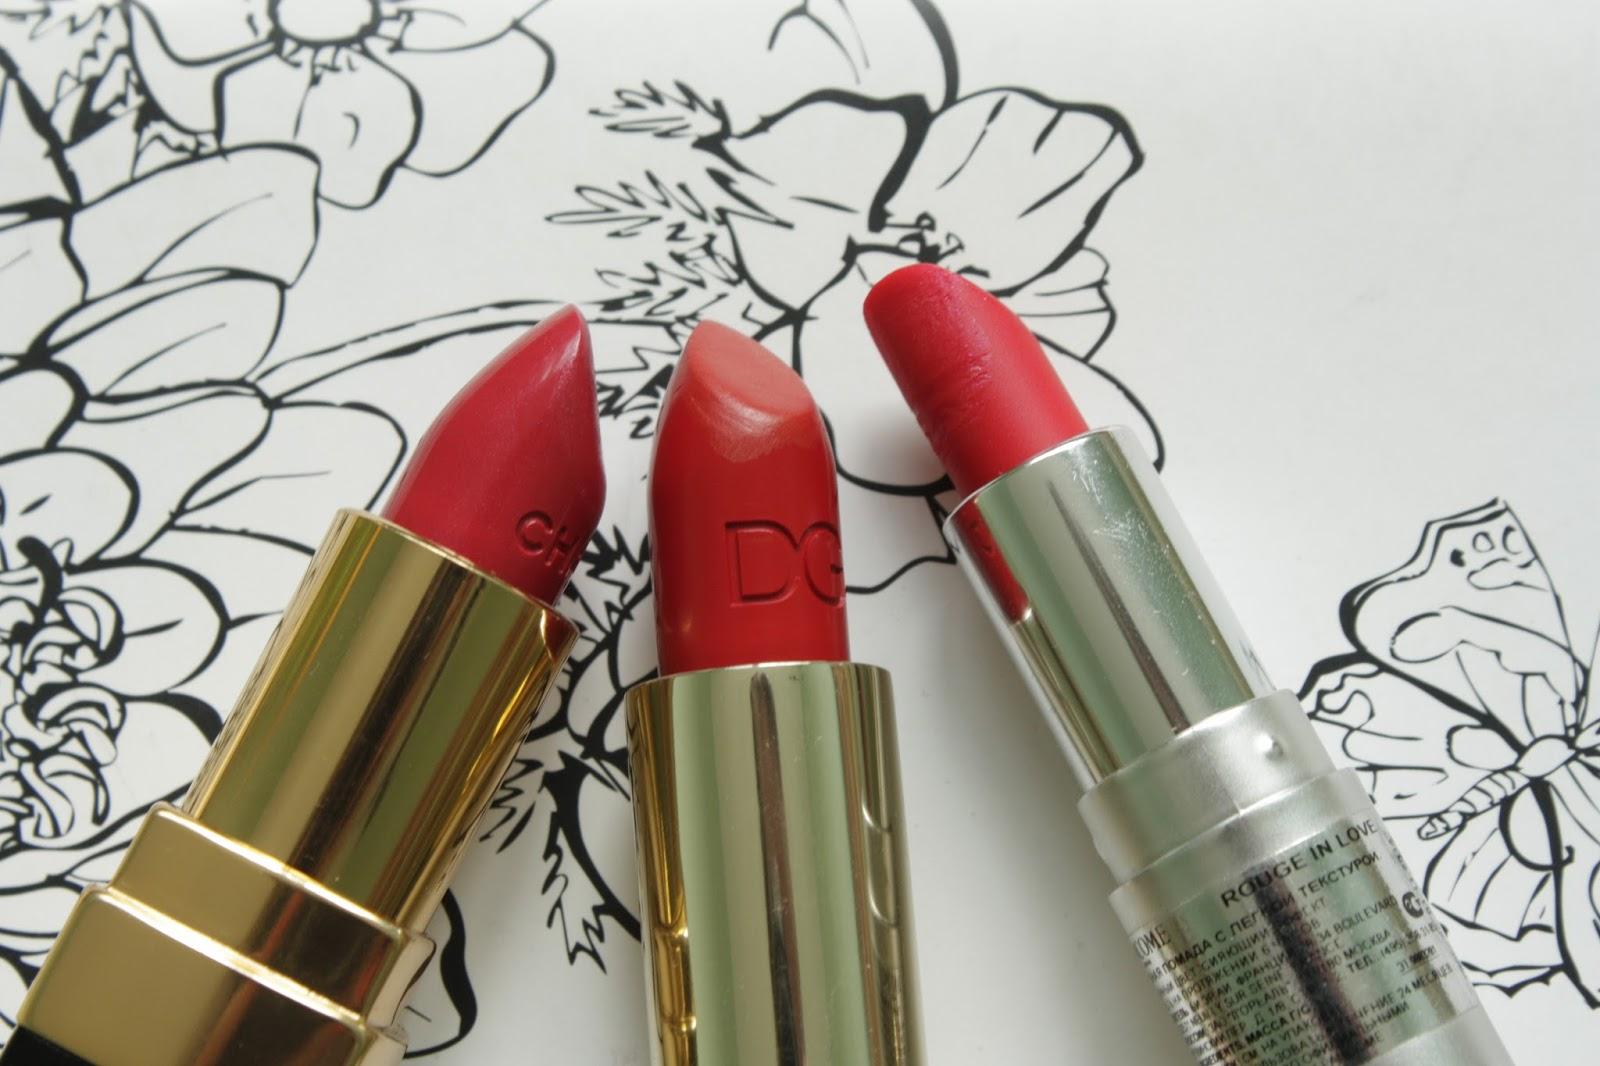 Chanel Rouge Coco Ultra Hydrating Lip Colour В Оттенке 442 -4056